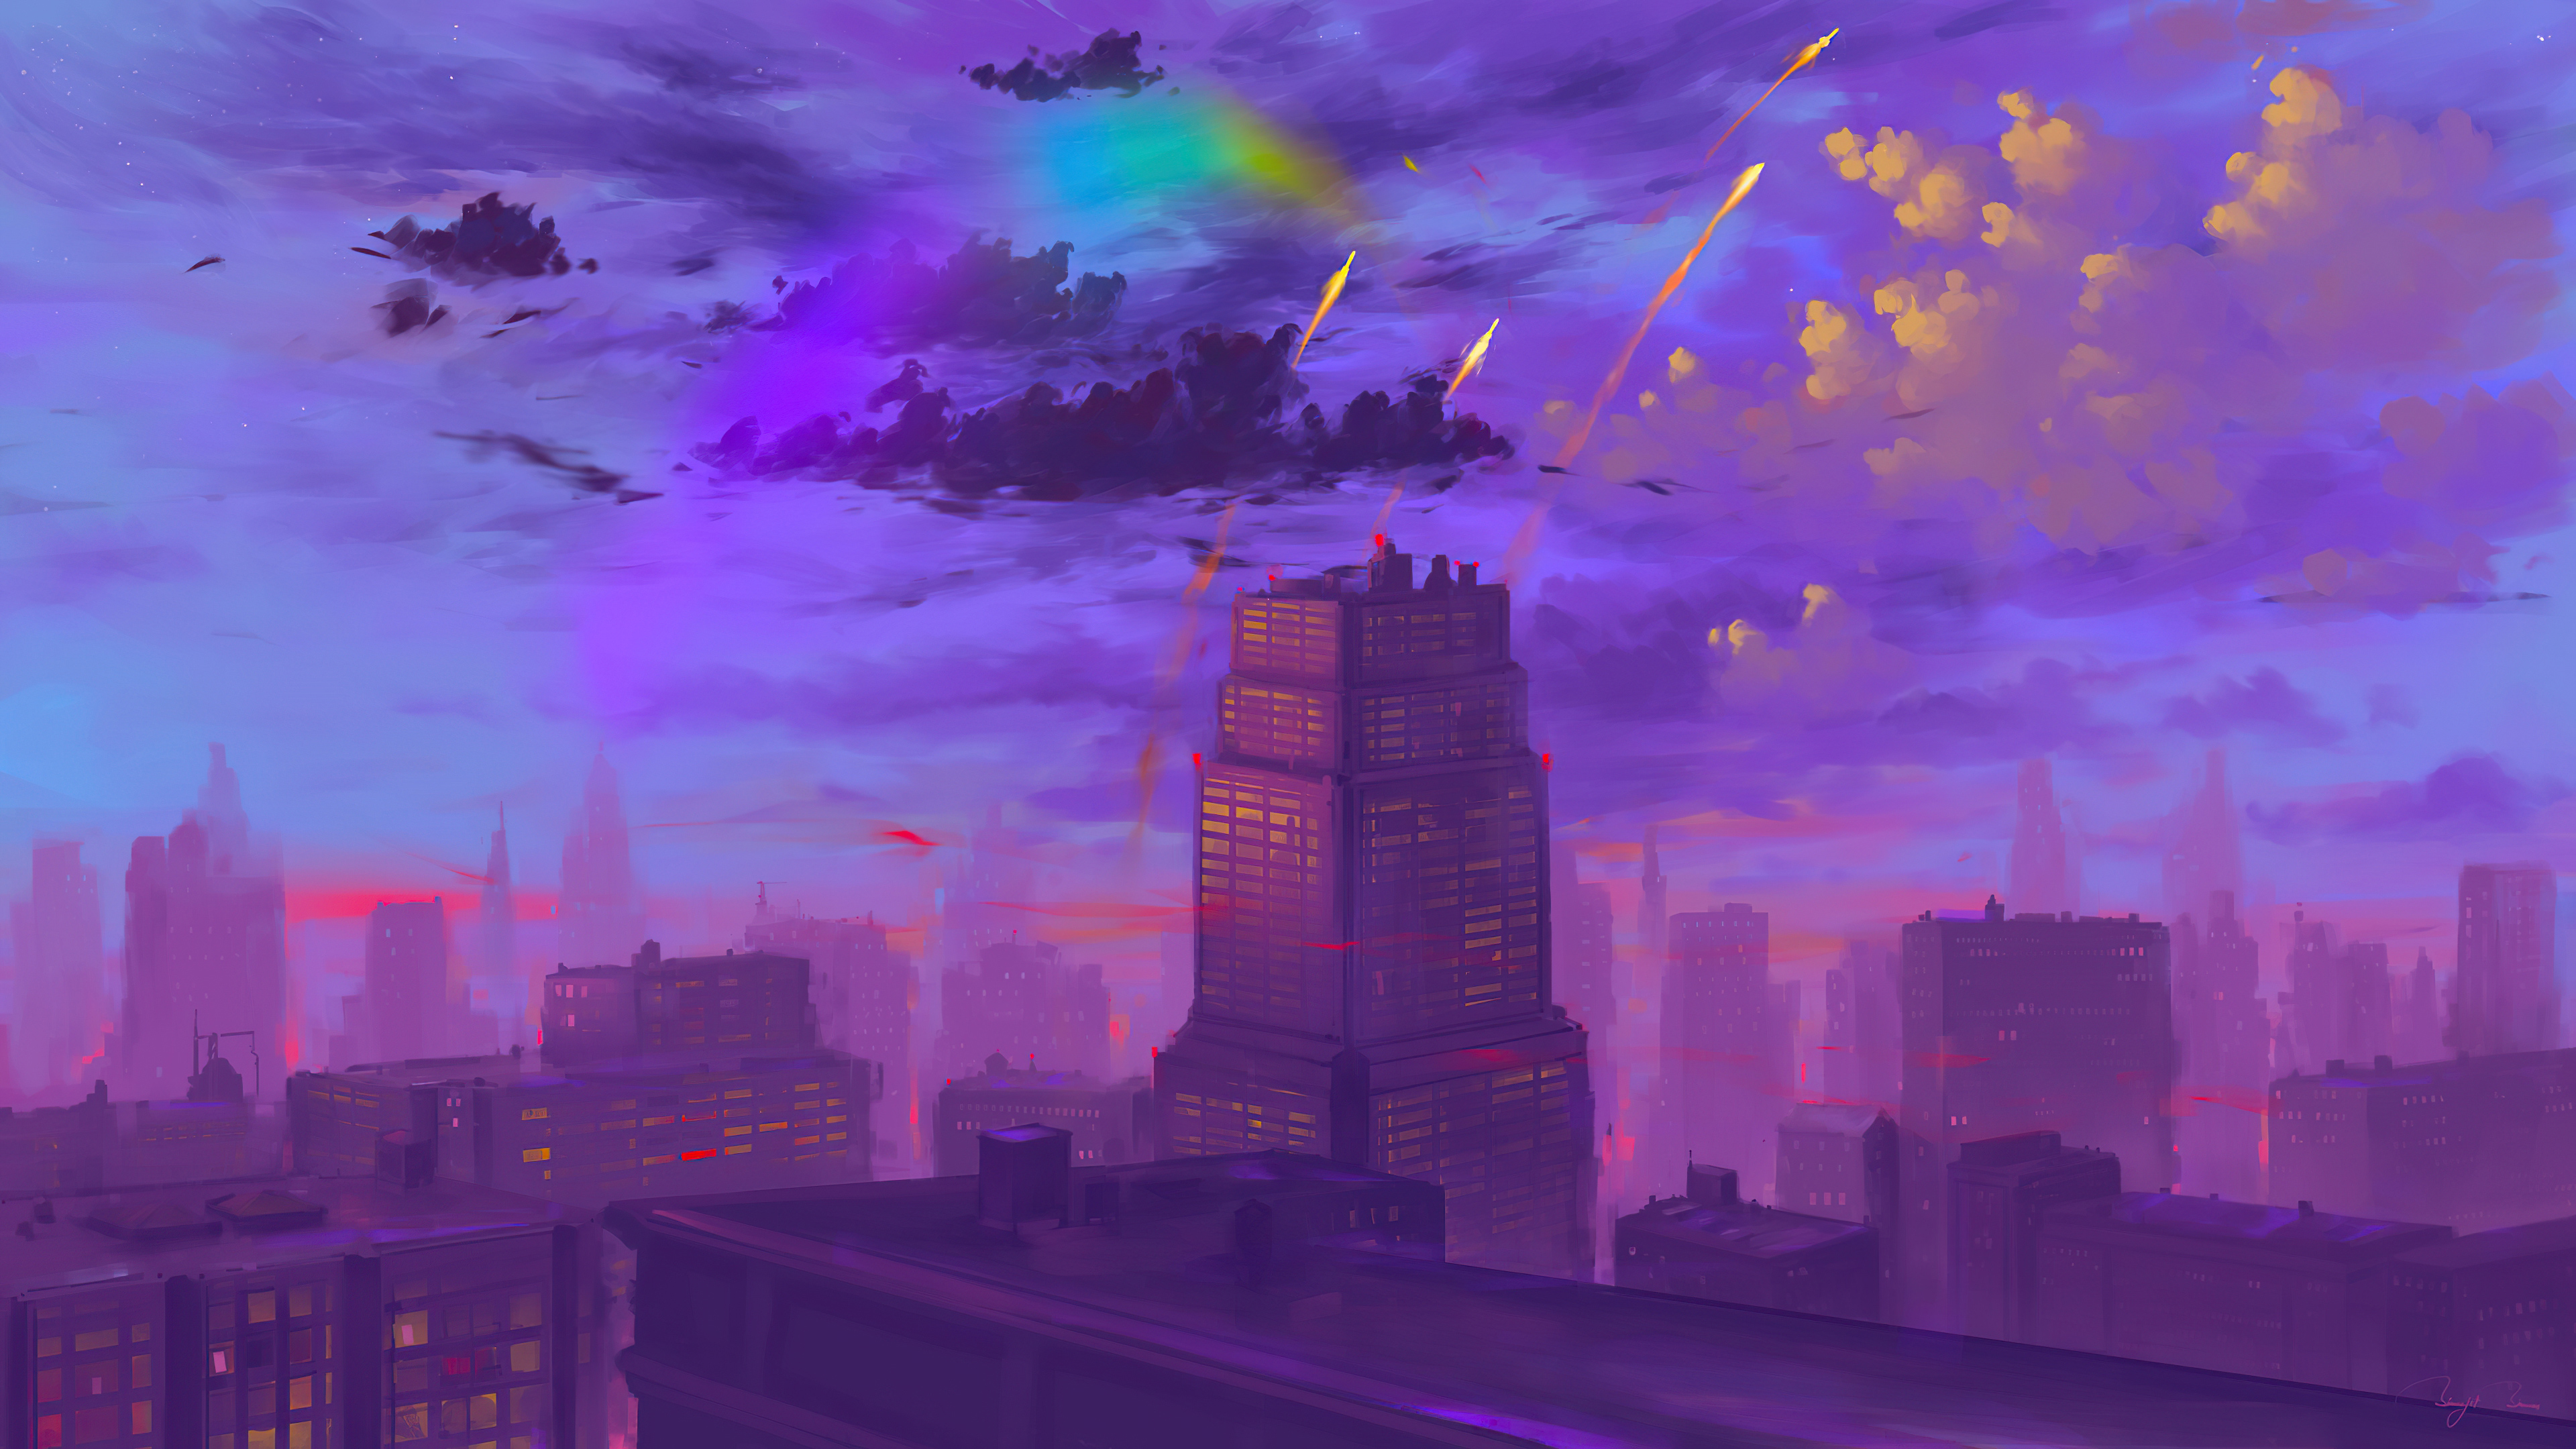 Wallpaper City Twilight Artwork